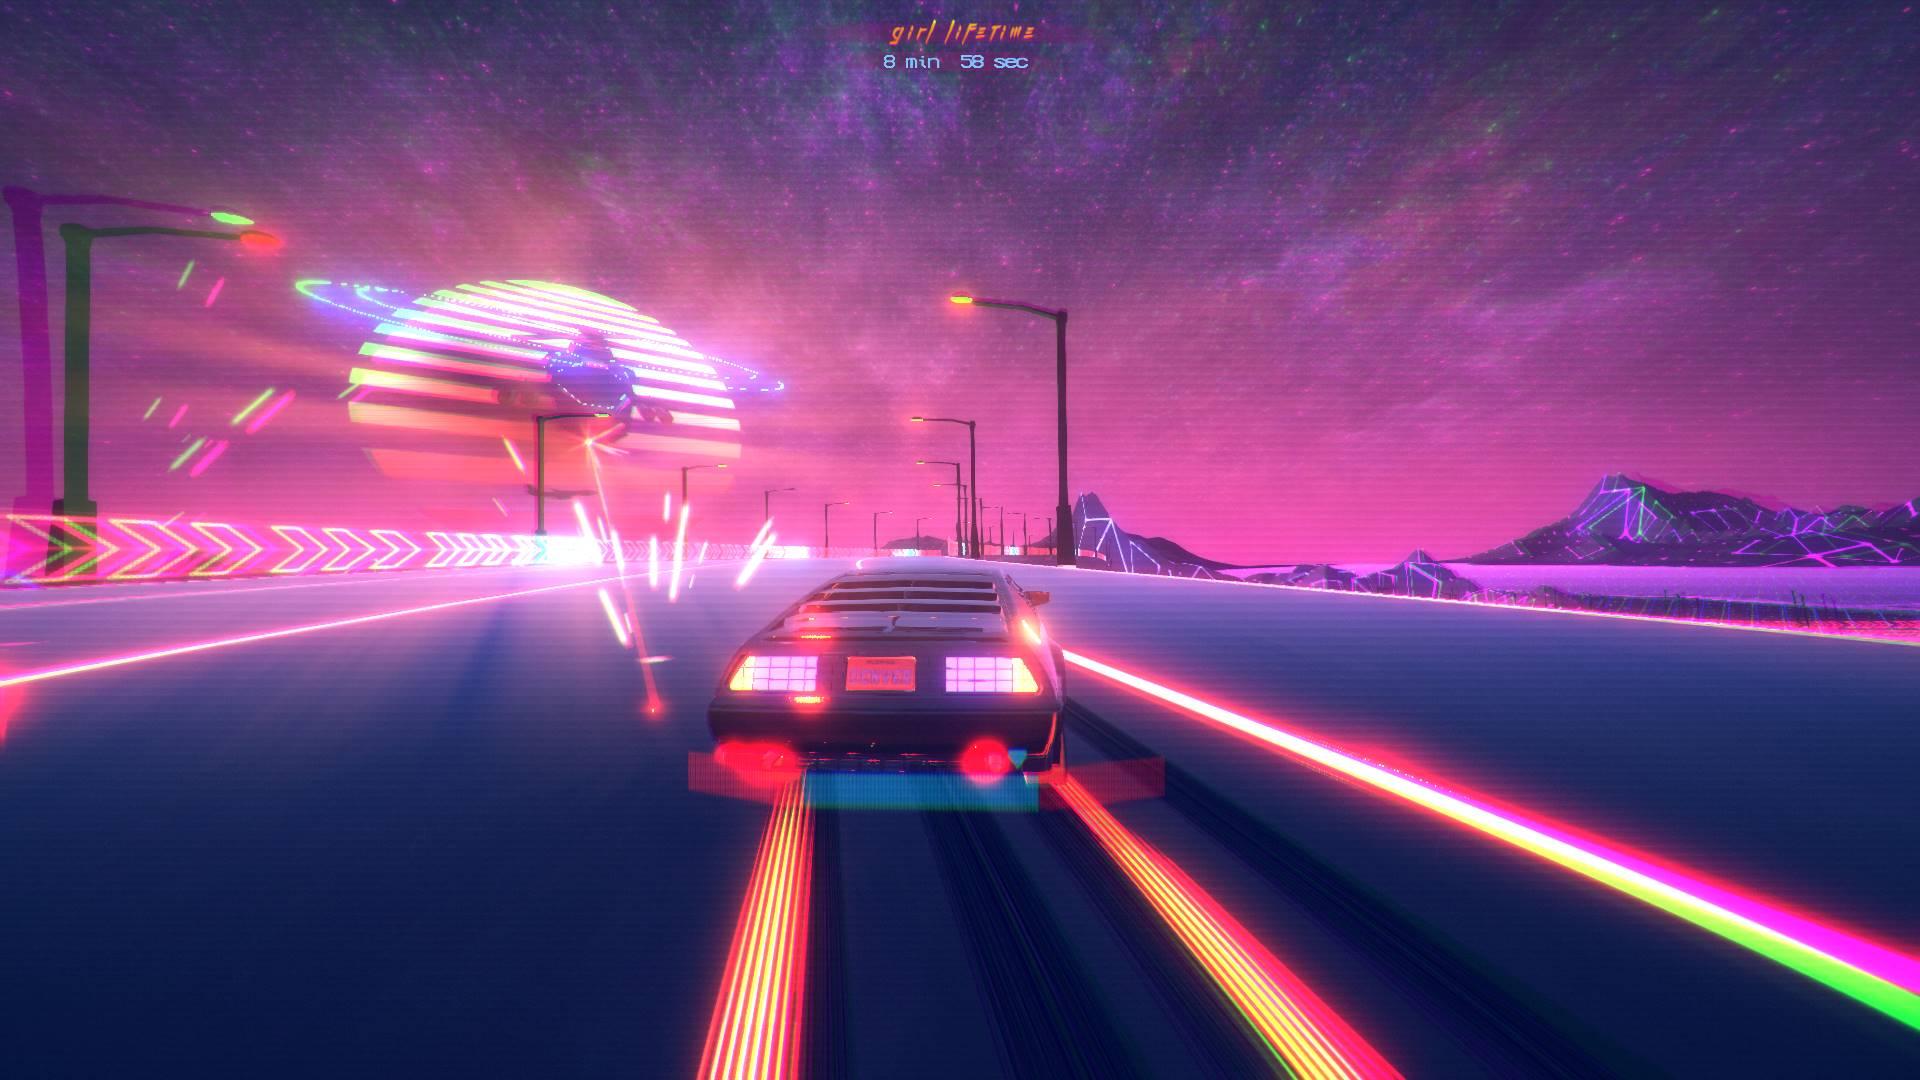 Neon Car Theme Wallpaper Download Outdrive Full Pc Game